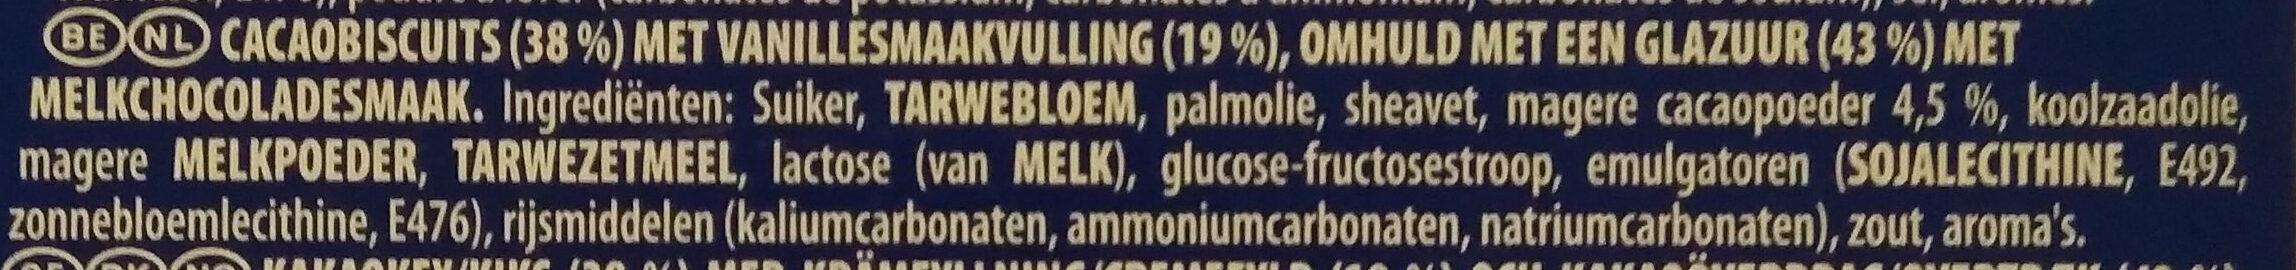 Milk Chocolate Covered Biscuits 6 Pack - Ingrediënten - nl